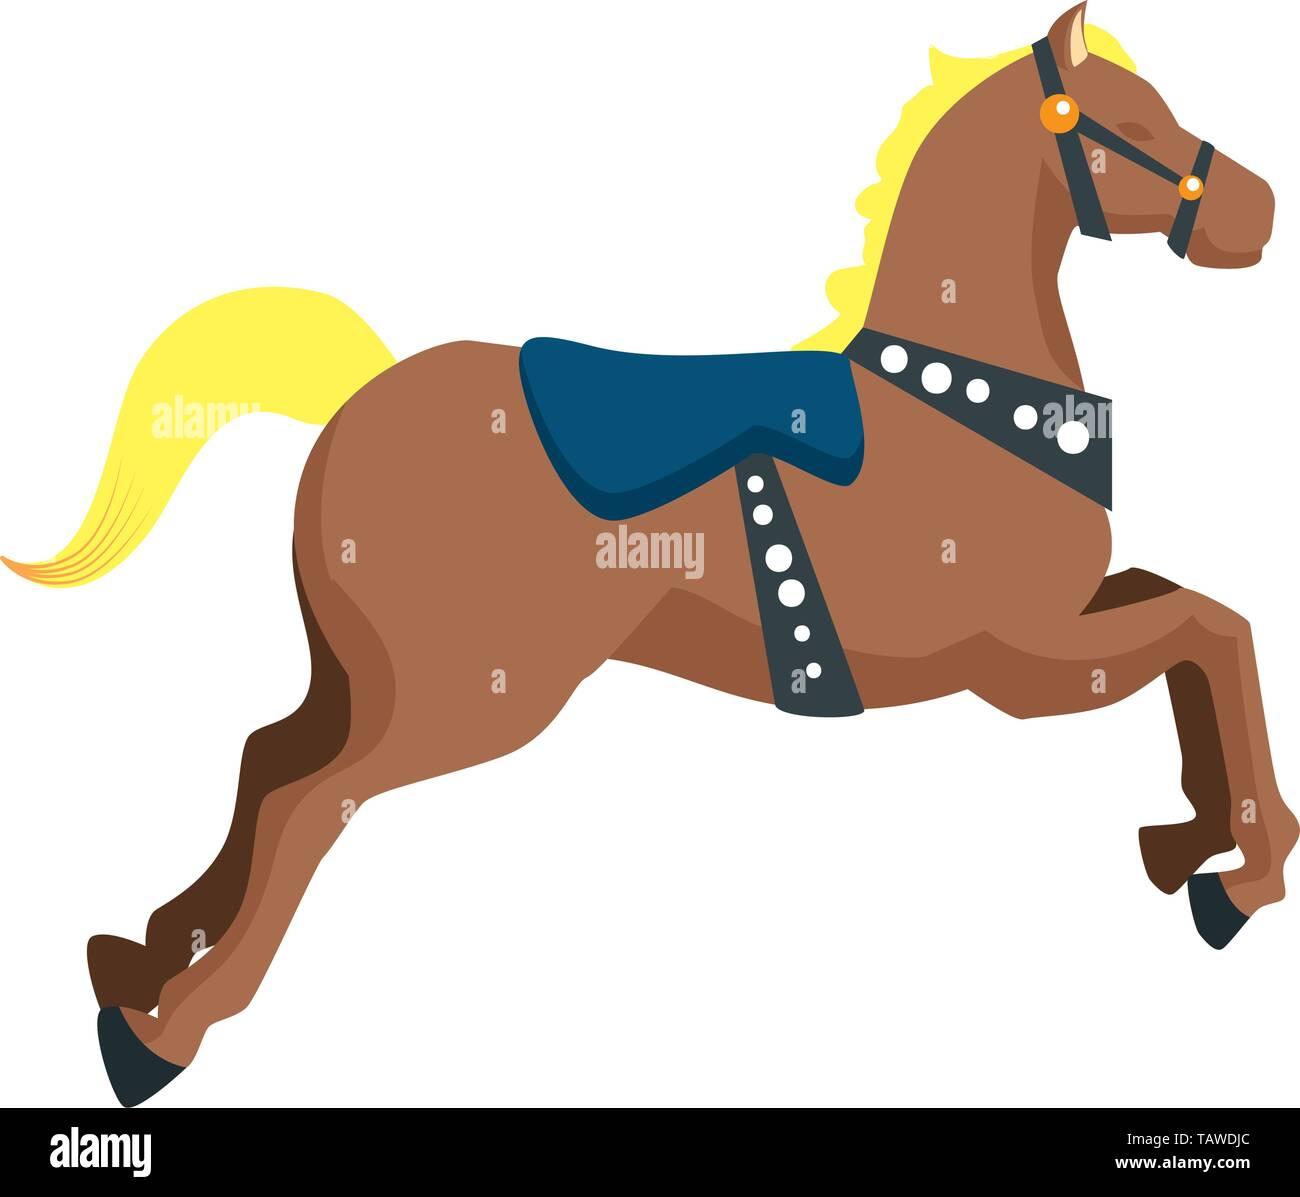 Carousel Horse Carnival Icon Vector Illustration Stock Vector Image Art Alamy